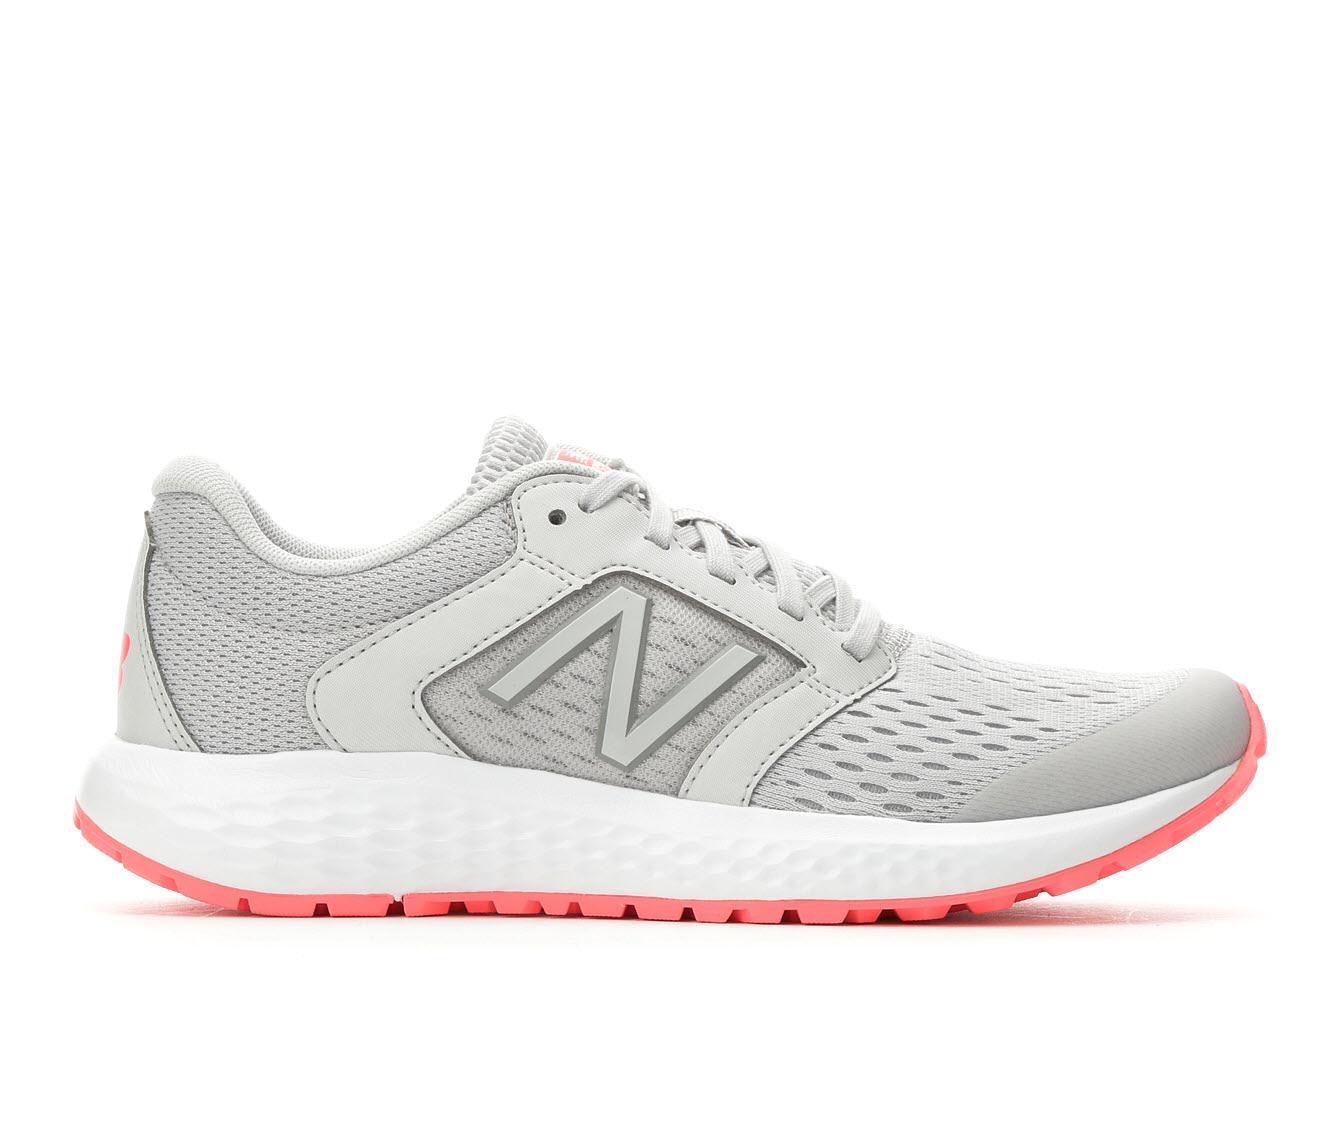 New Balance W520v5 Women's Athletic Shoe (Gray)